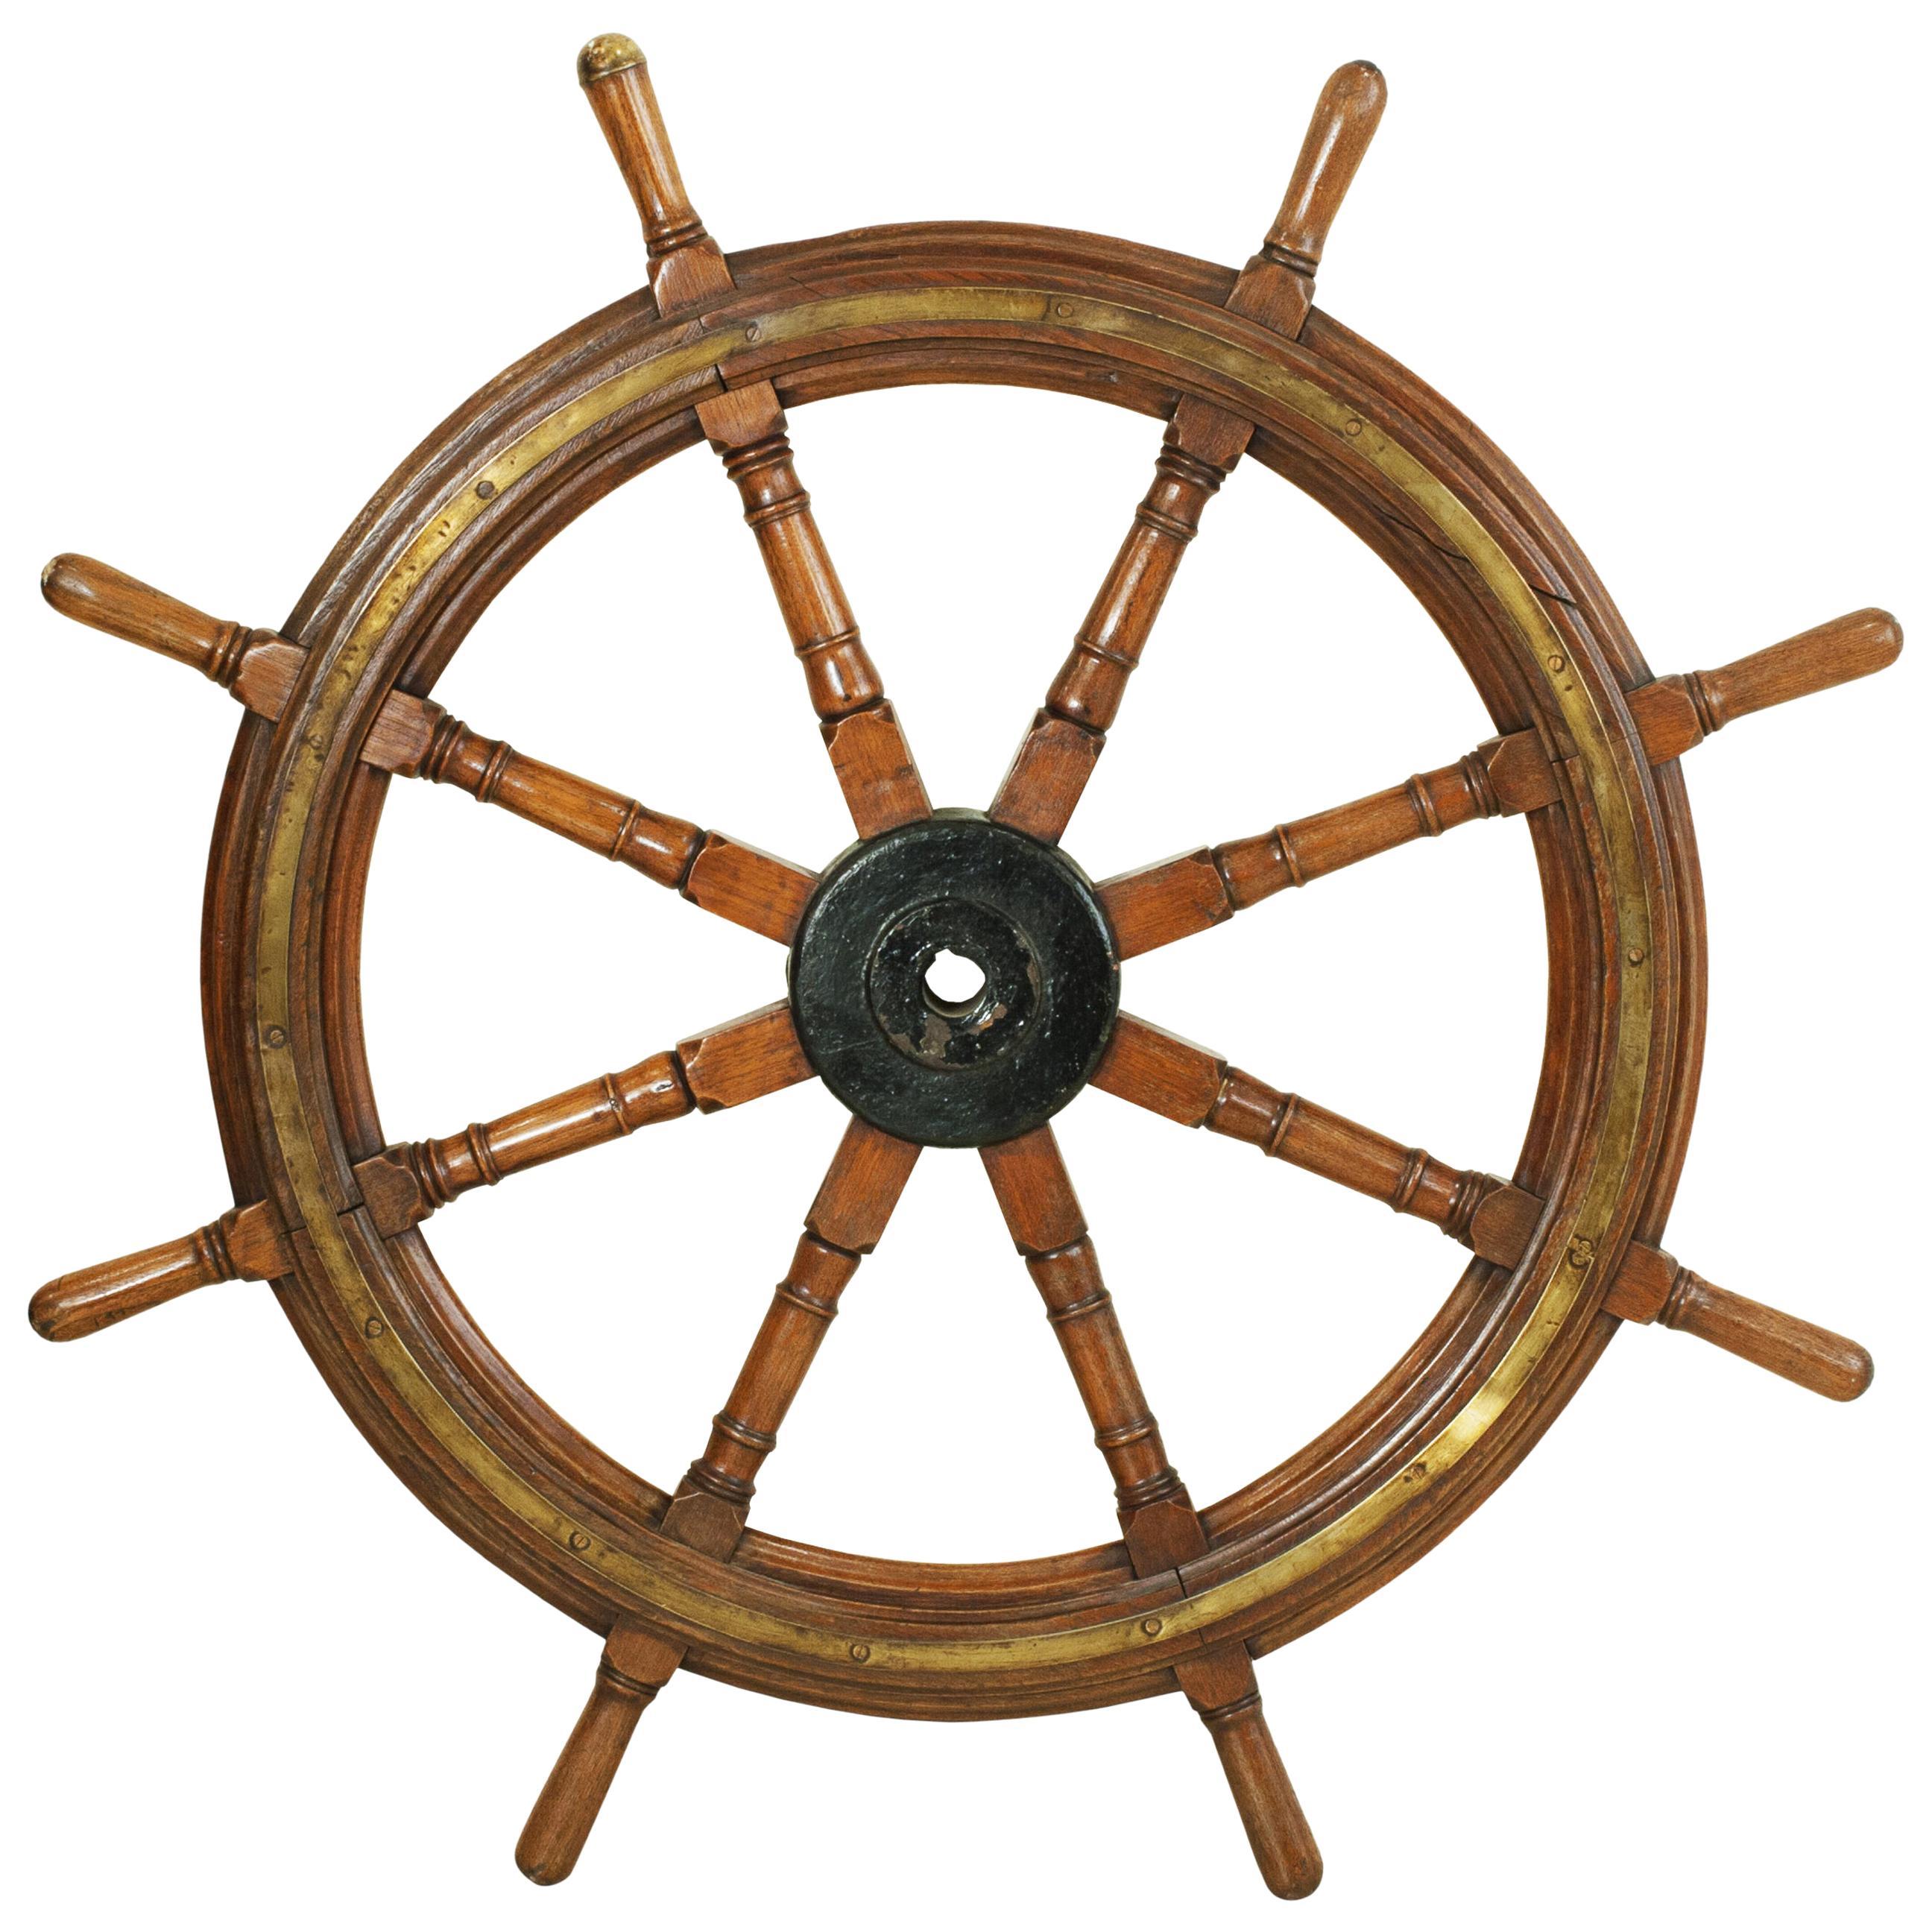 Antique Ships Wheel, Teak Helm Wheel